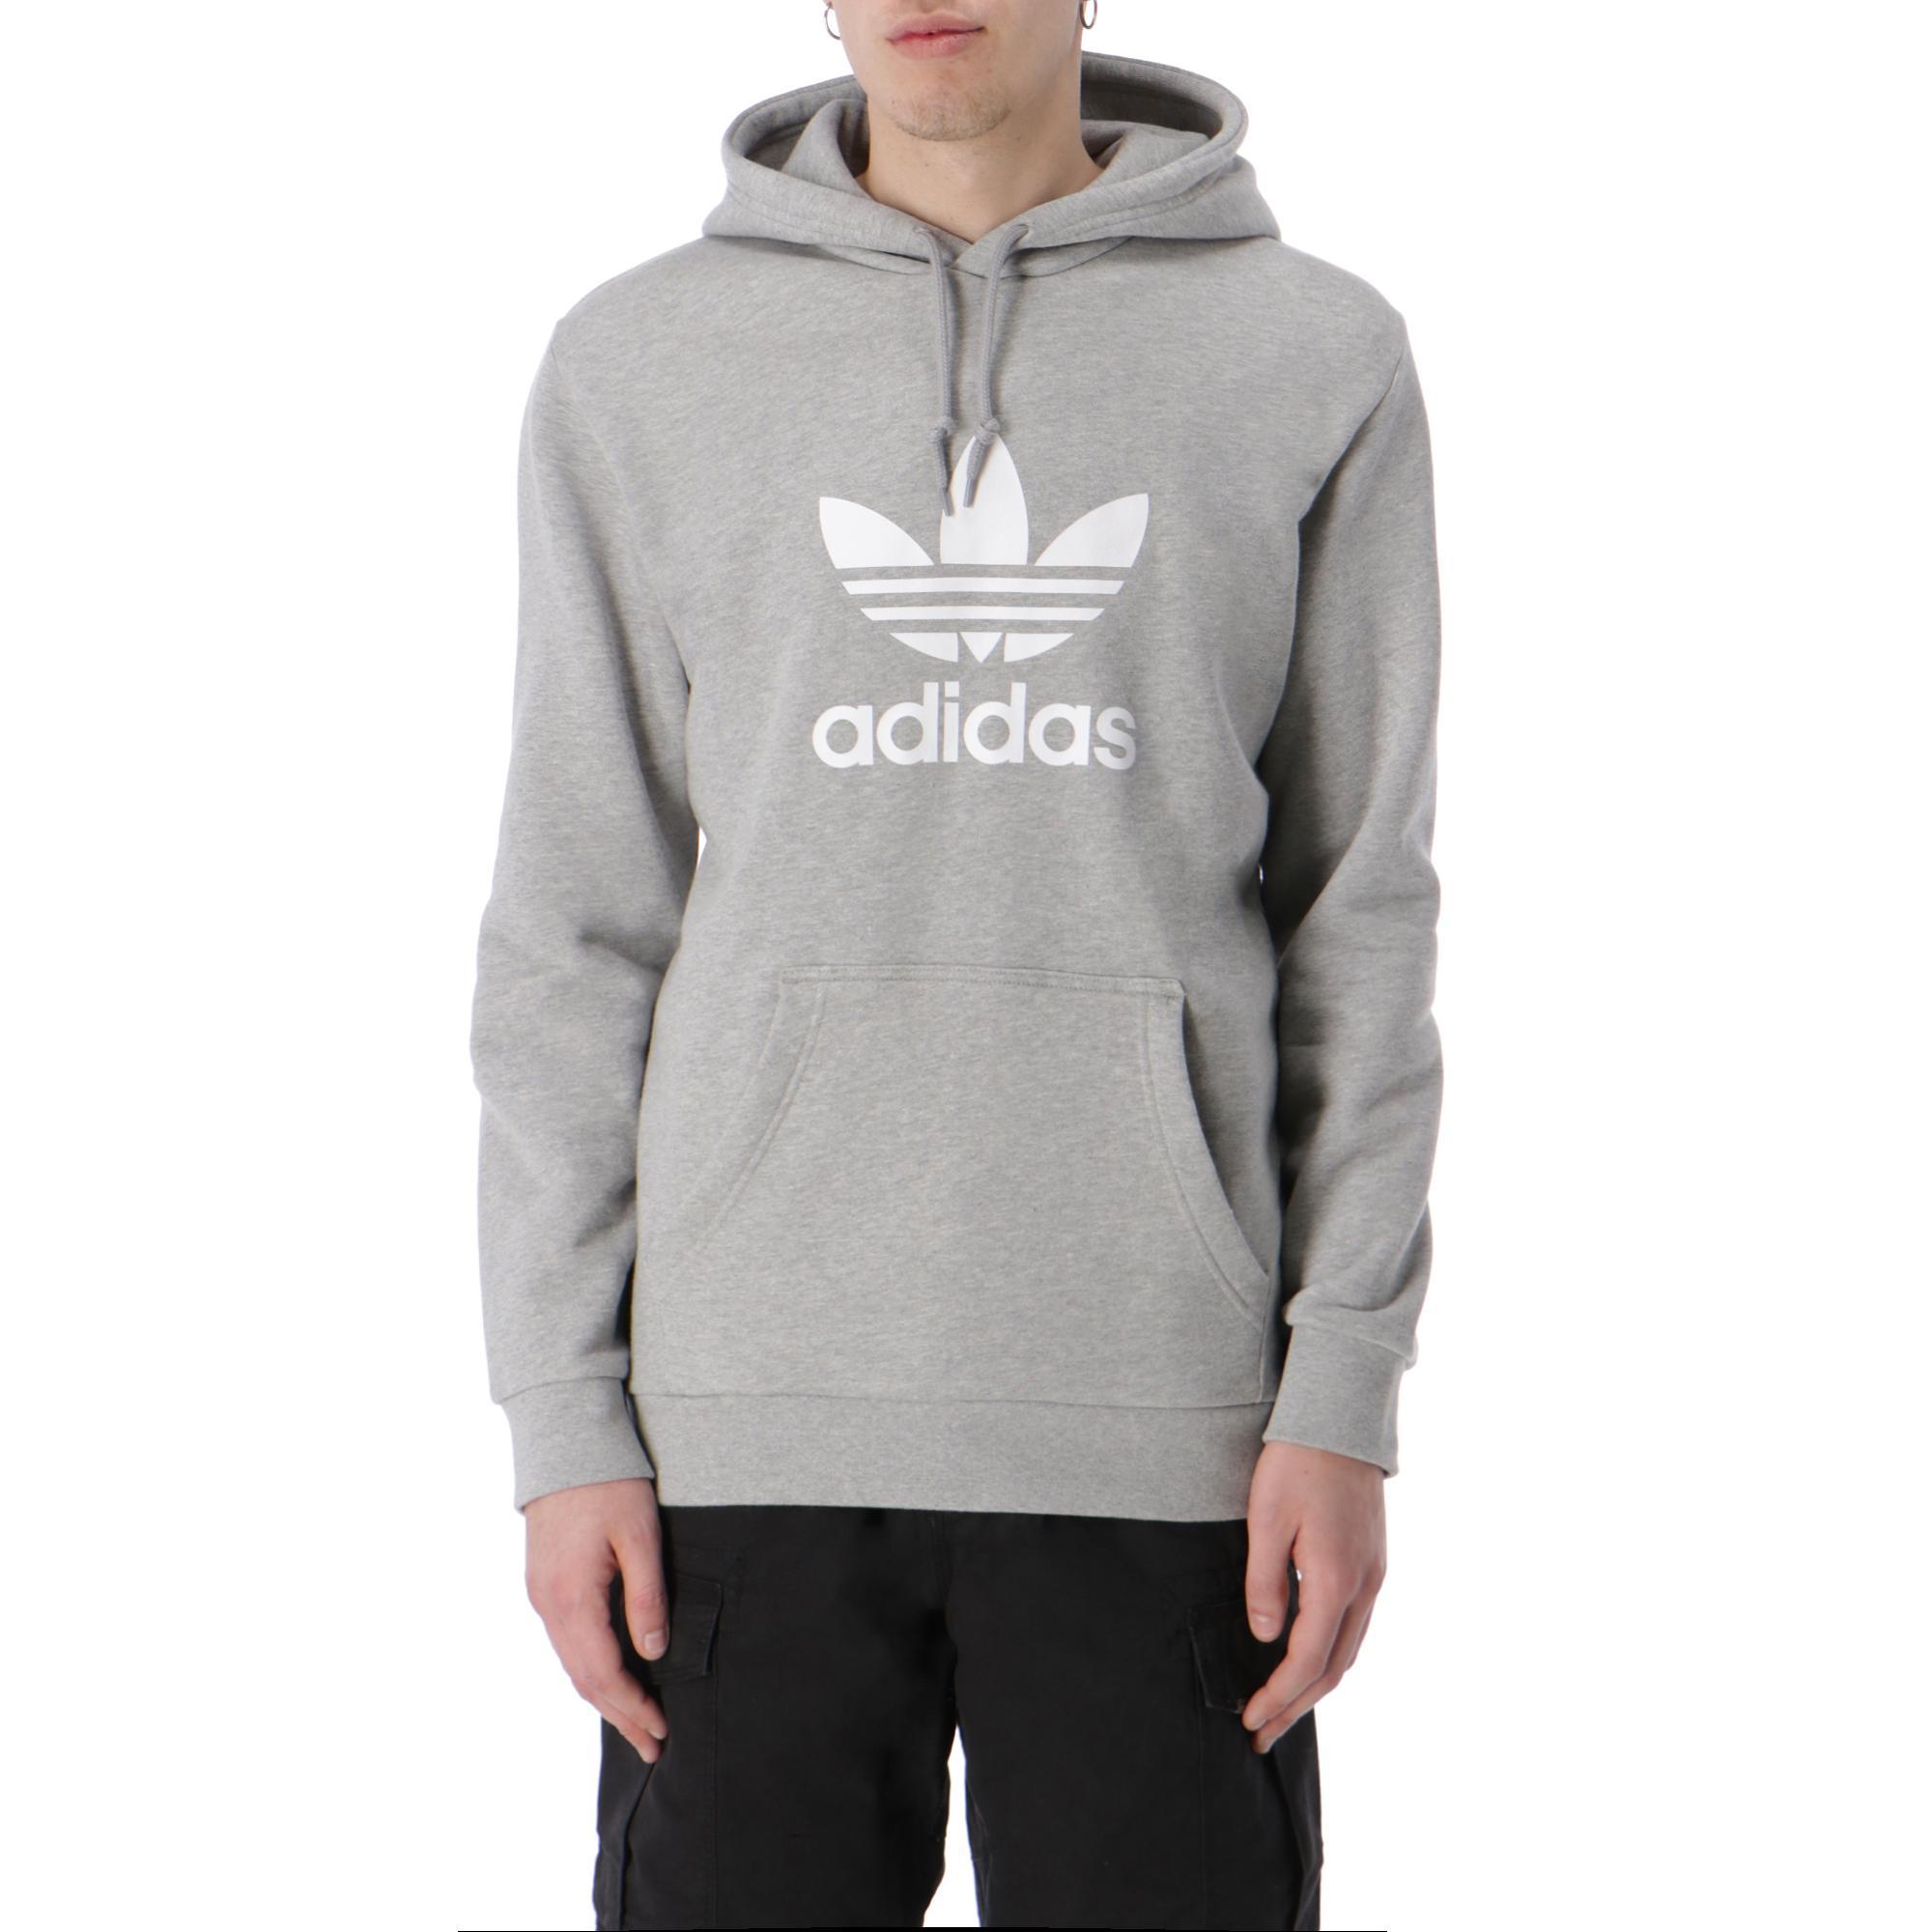 adidas Originals Trefoil Warm Up Hoodie XDJKNRL